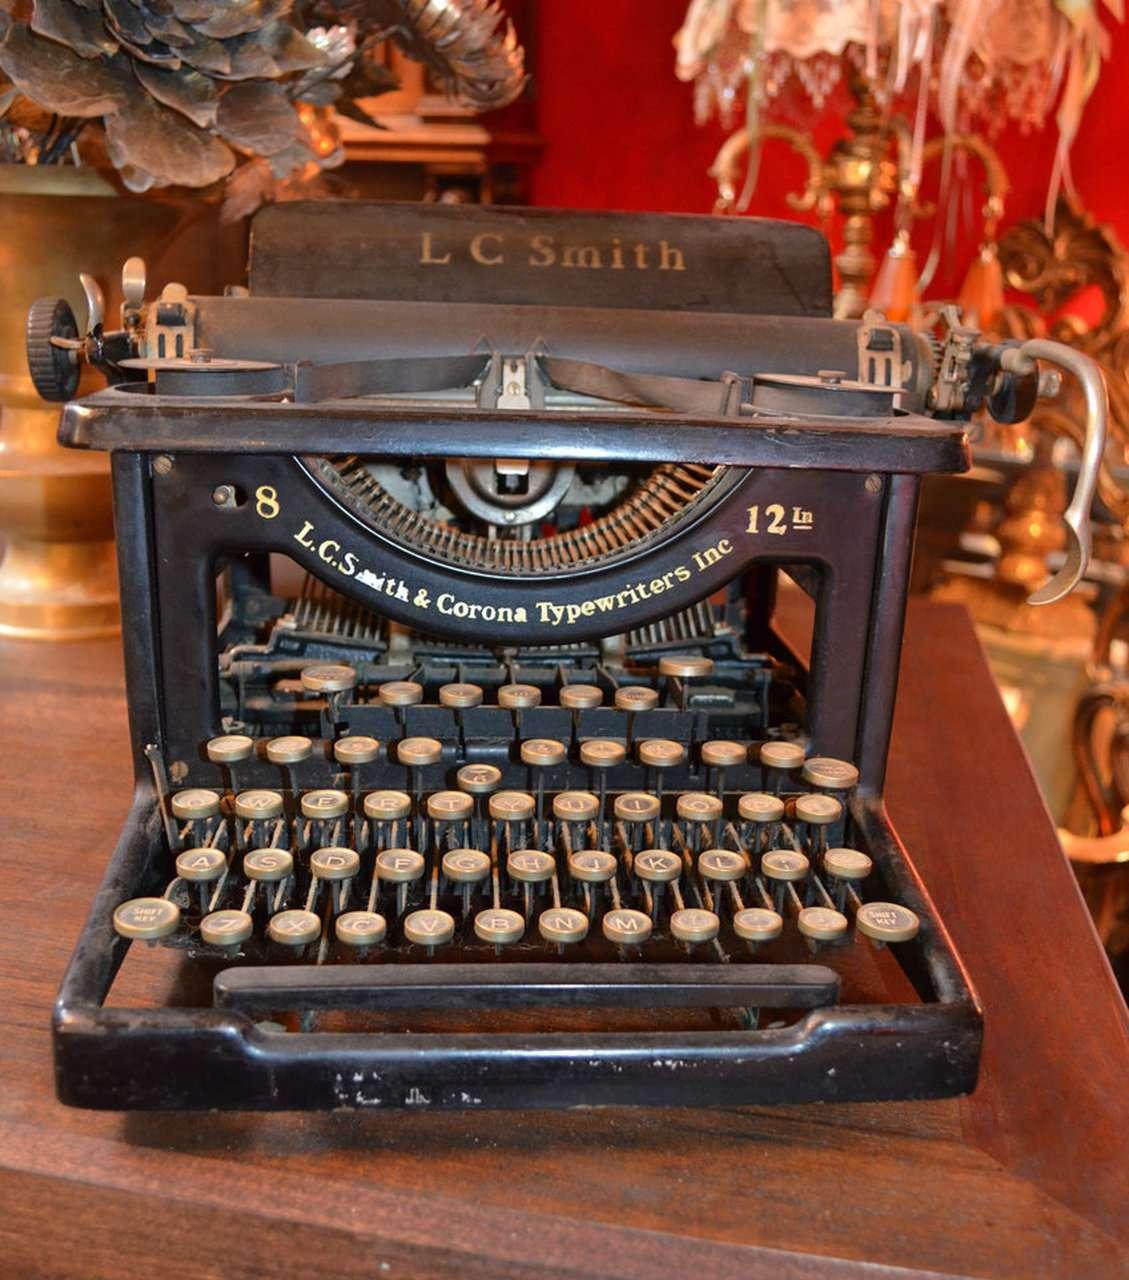 Lc Smith & Corona Typewriter